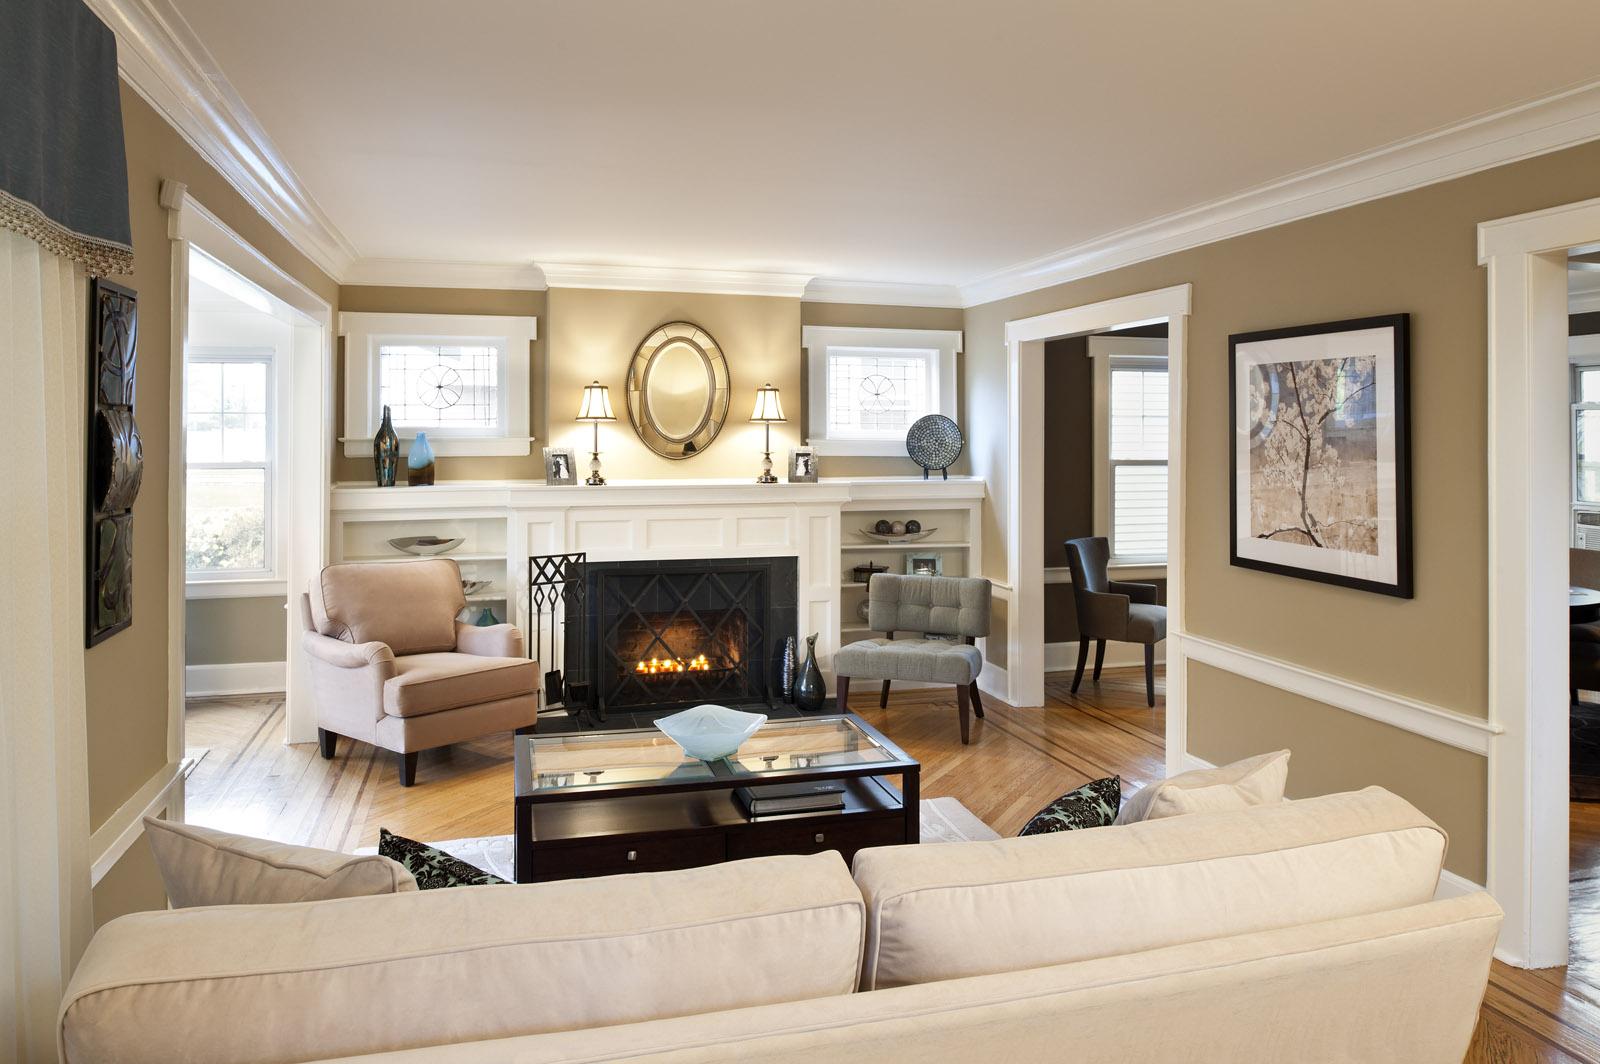 Peachy Den Bedroom Ideas Den Decorating Ideas Decorating Ideas Sue Largest Home Design Picture Inspirations Pitcheantrous